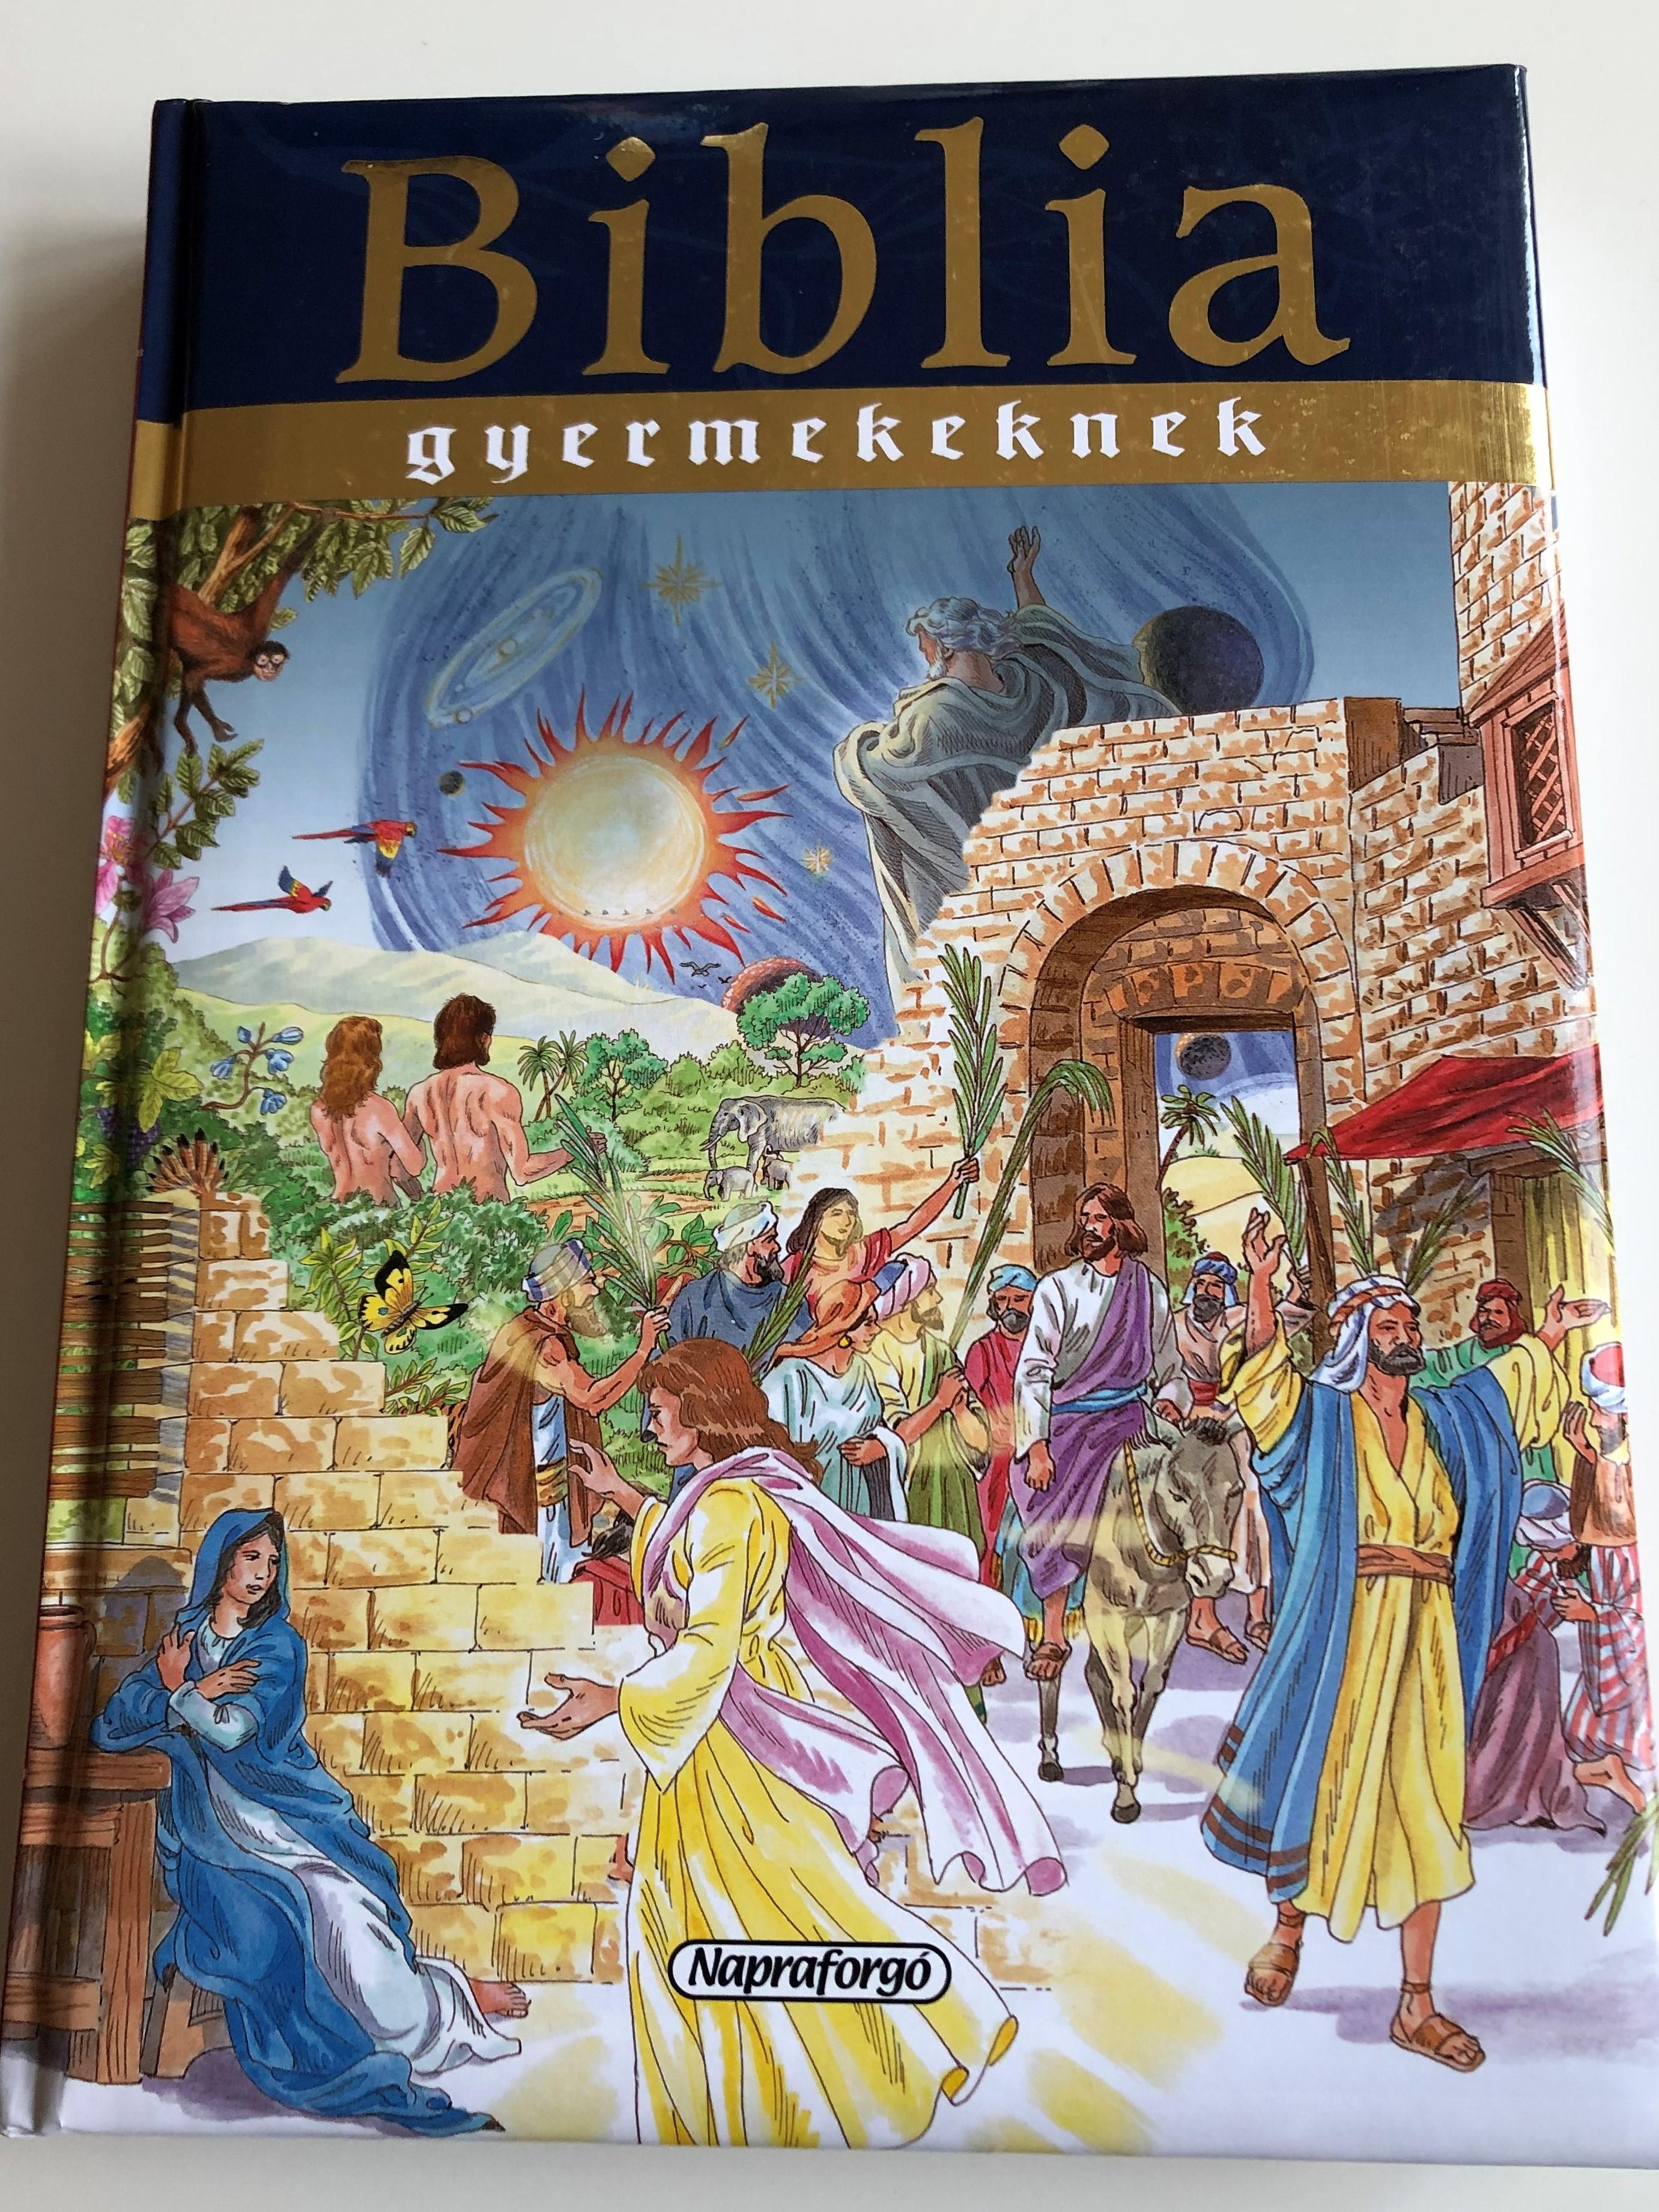 biblia-gyermekeknek-hungarian-bible-for-children-editor-campos-jim-nez-m-ria-hardcover-2010-napraforg-kiad-1-.jpg